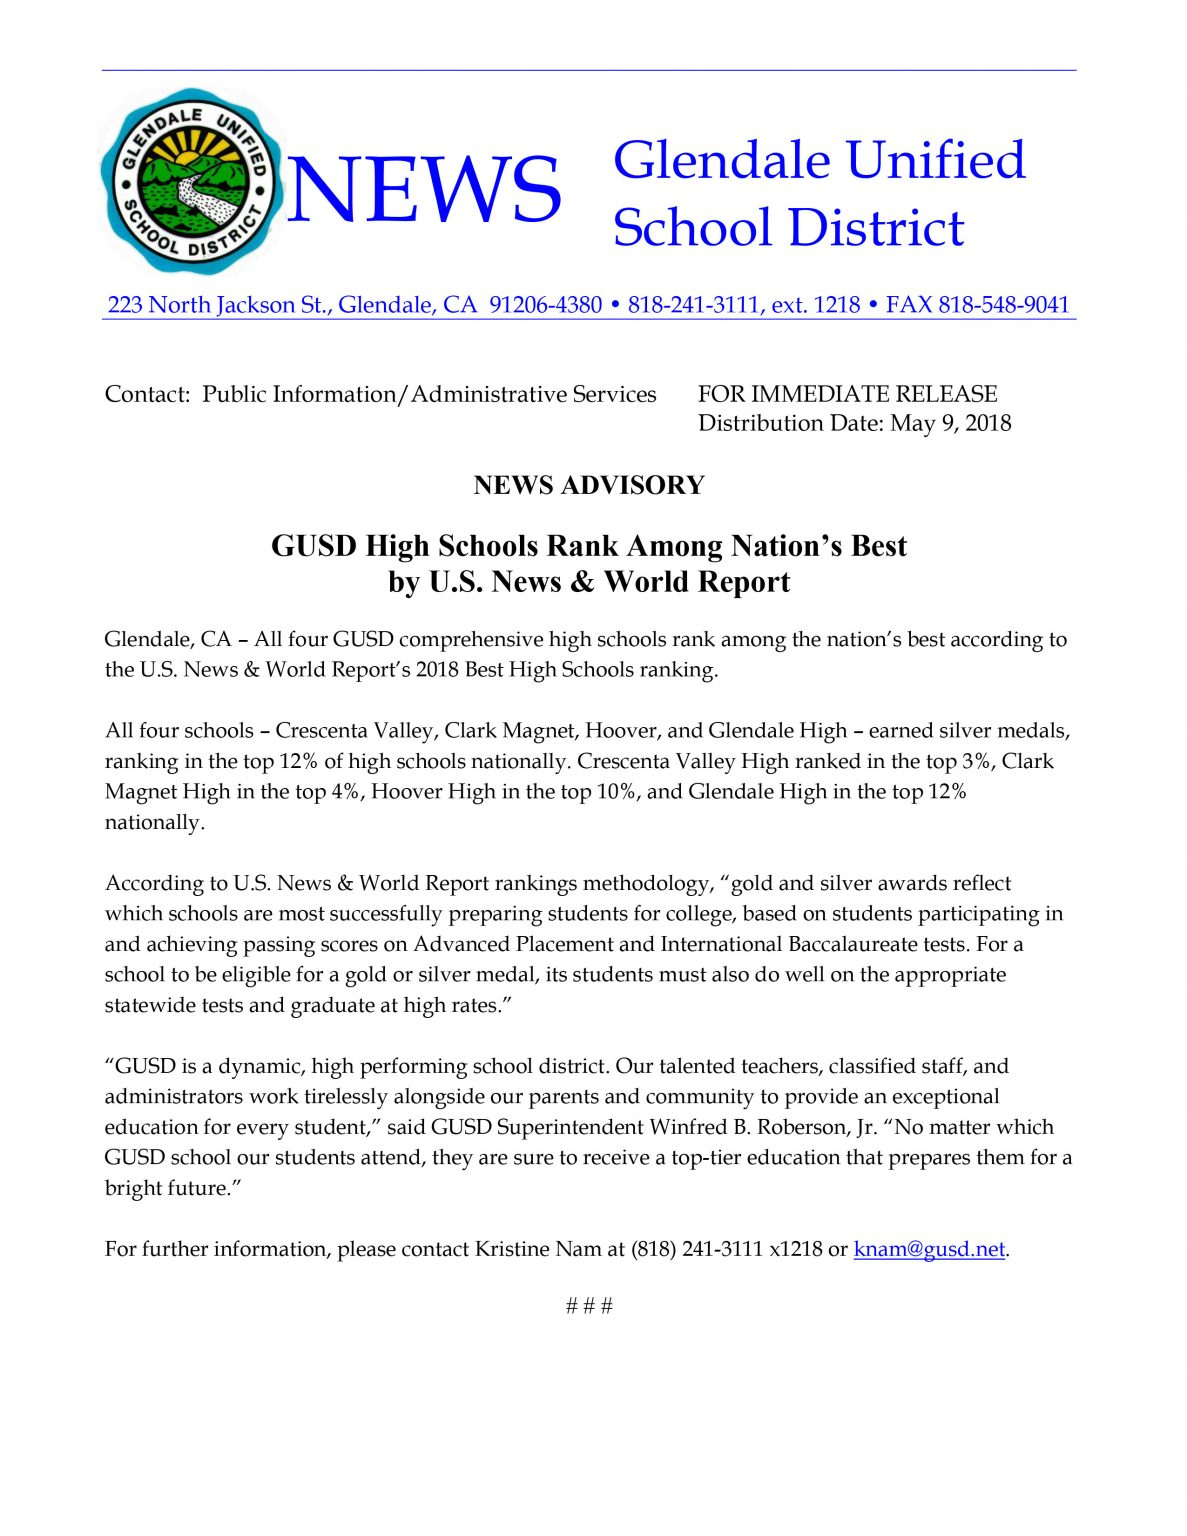 Glendale Unified School District Calendar   Printable For Mifflin County School District Graduation 2021